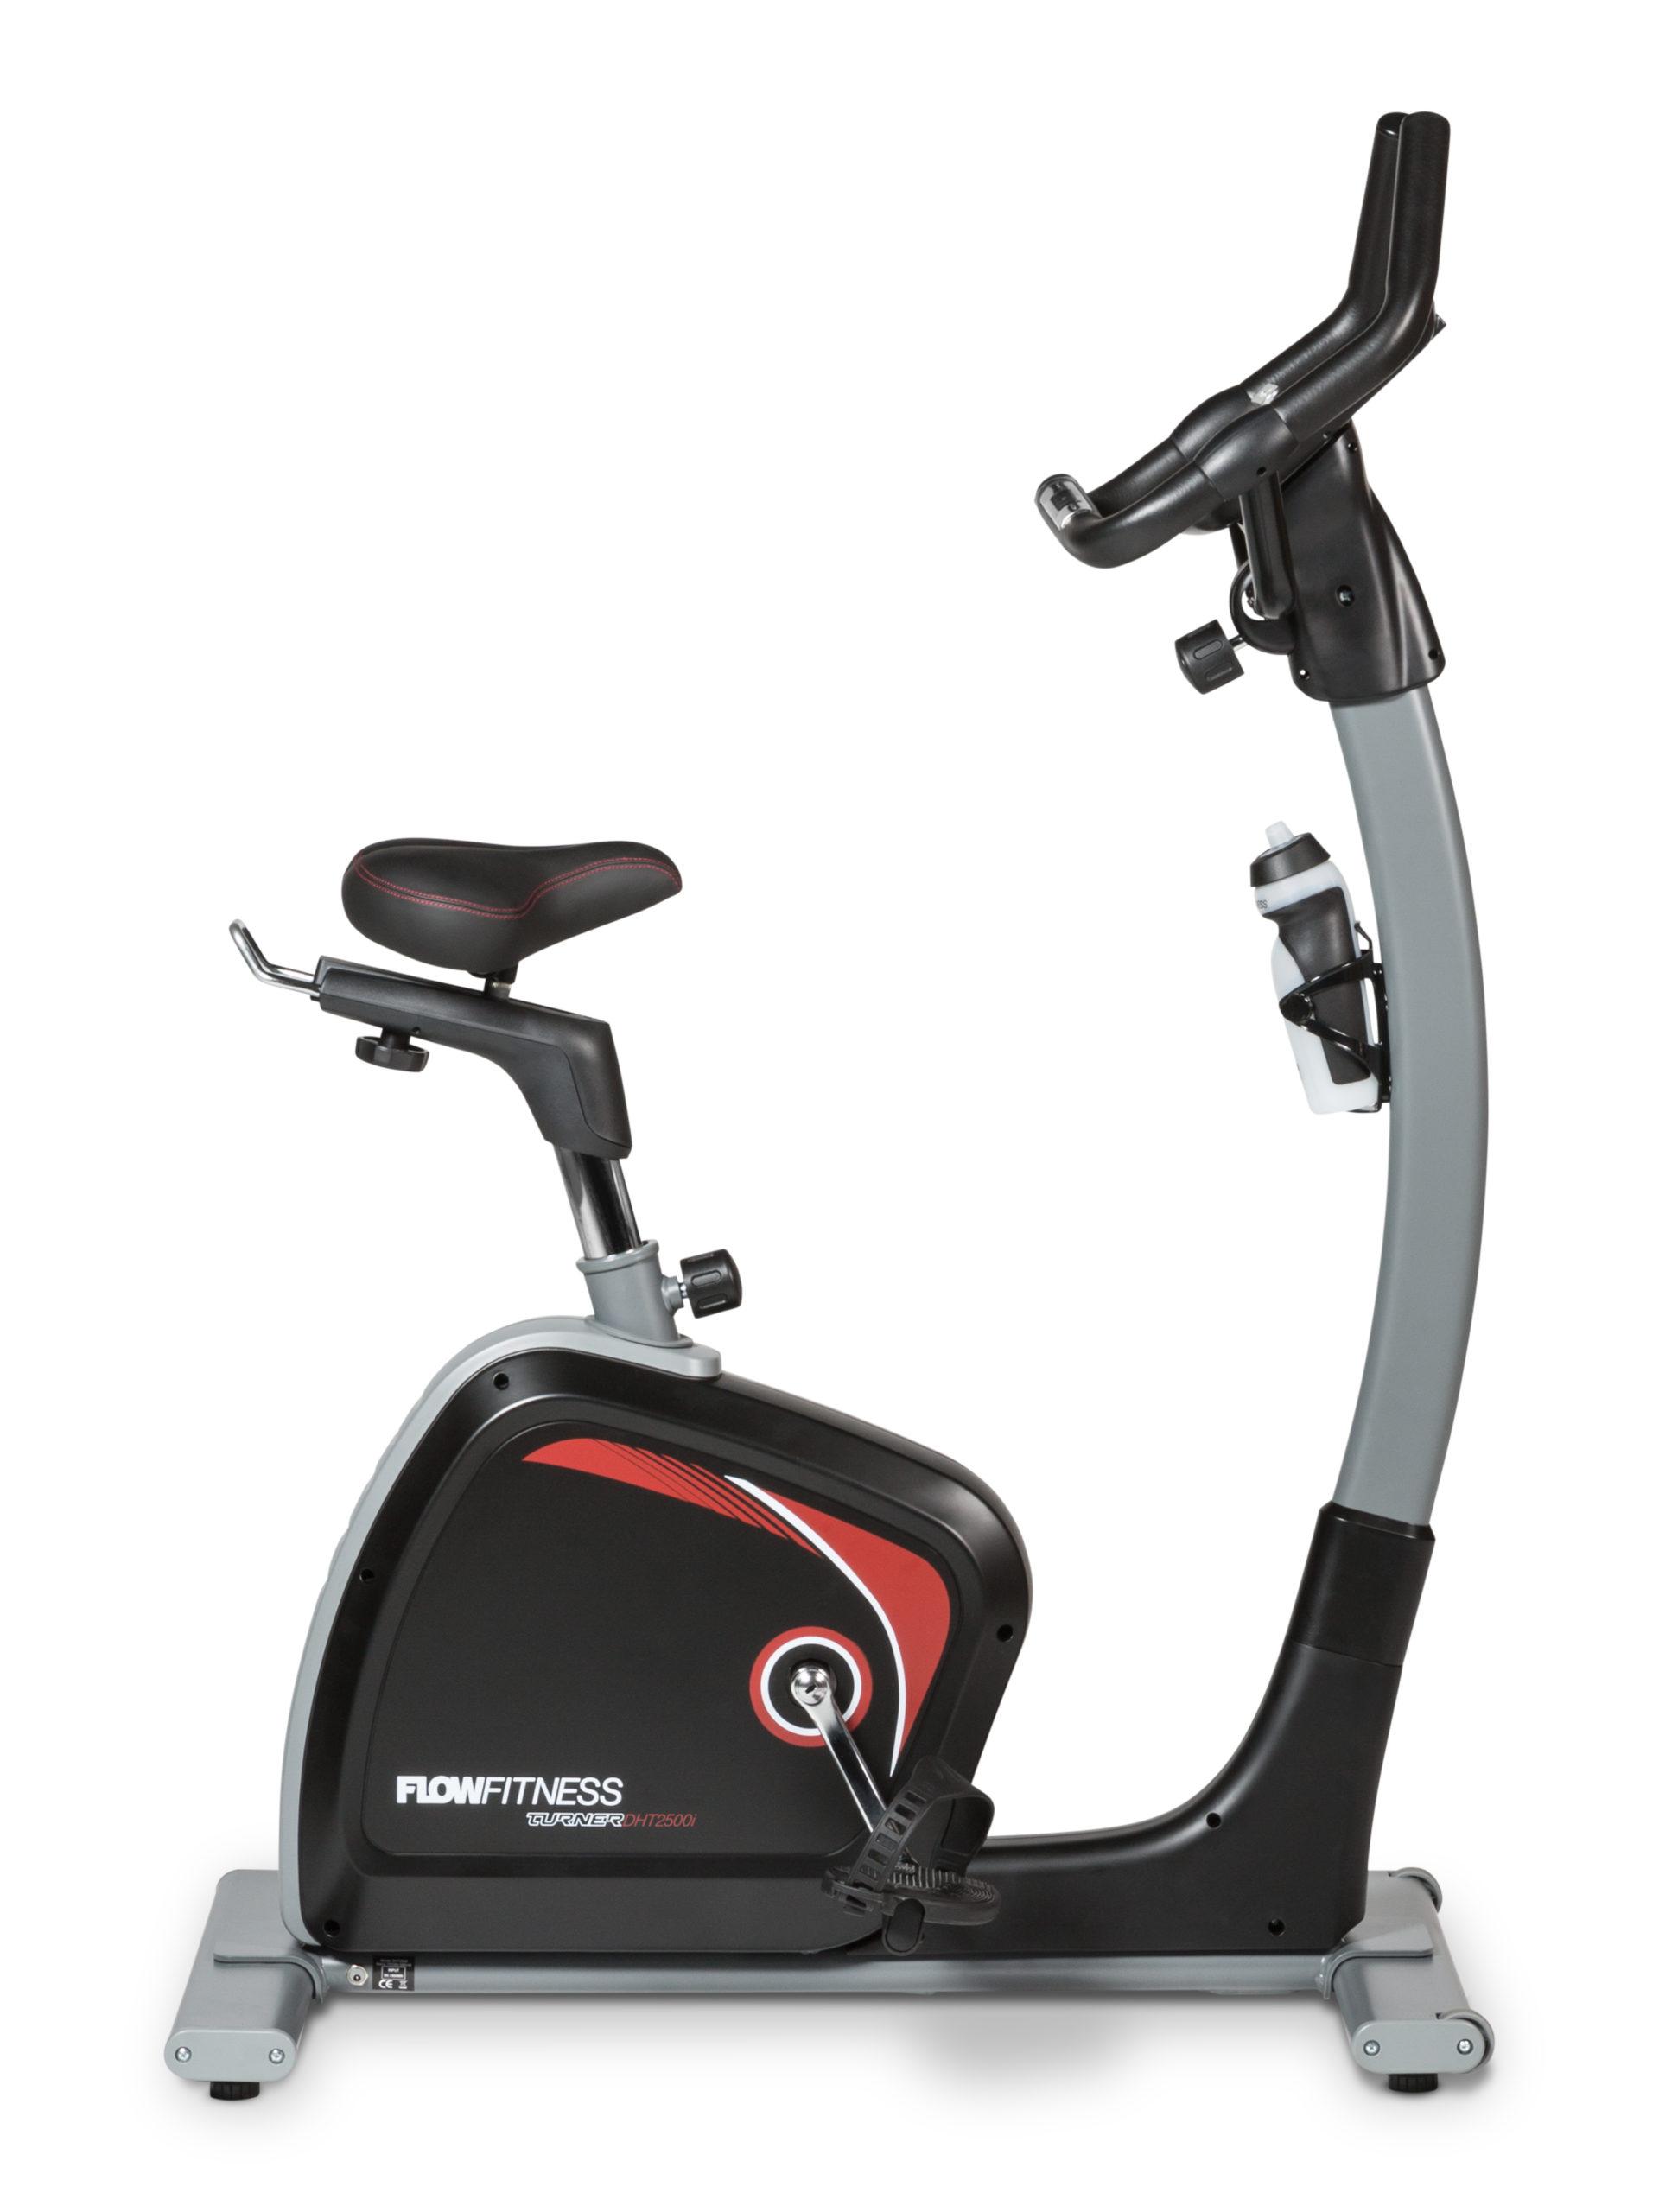 Flow Fitness Tabel Turner DHT2500i Hometrainer 24